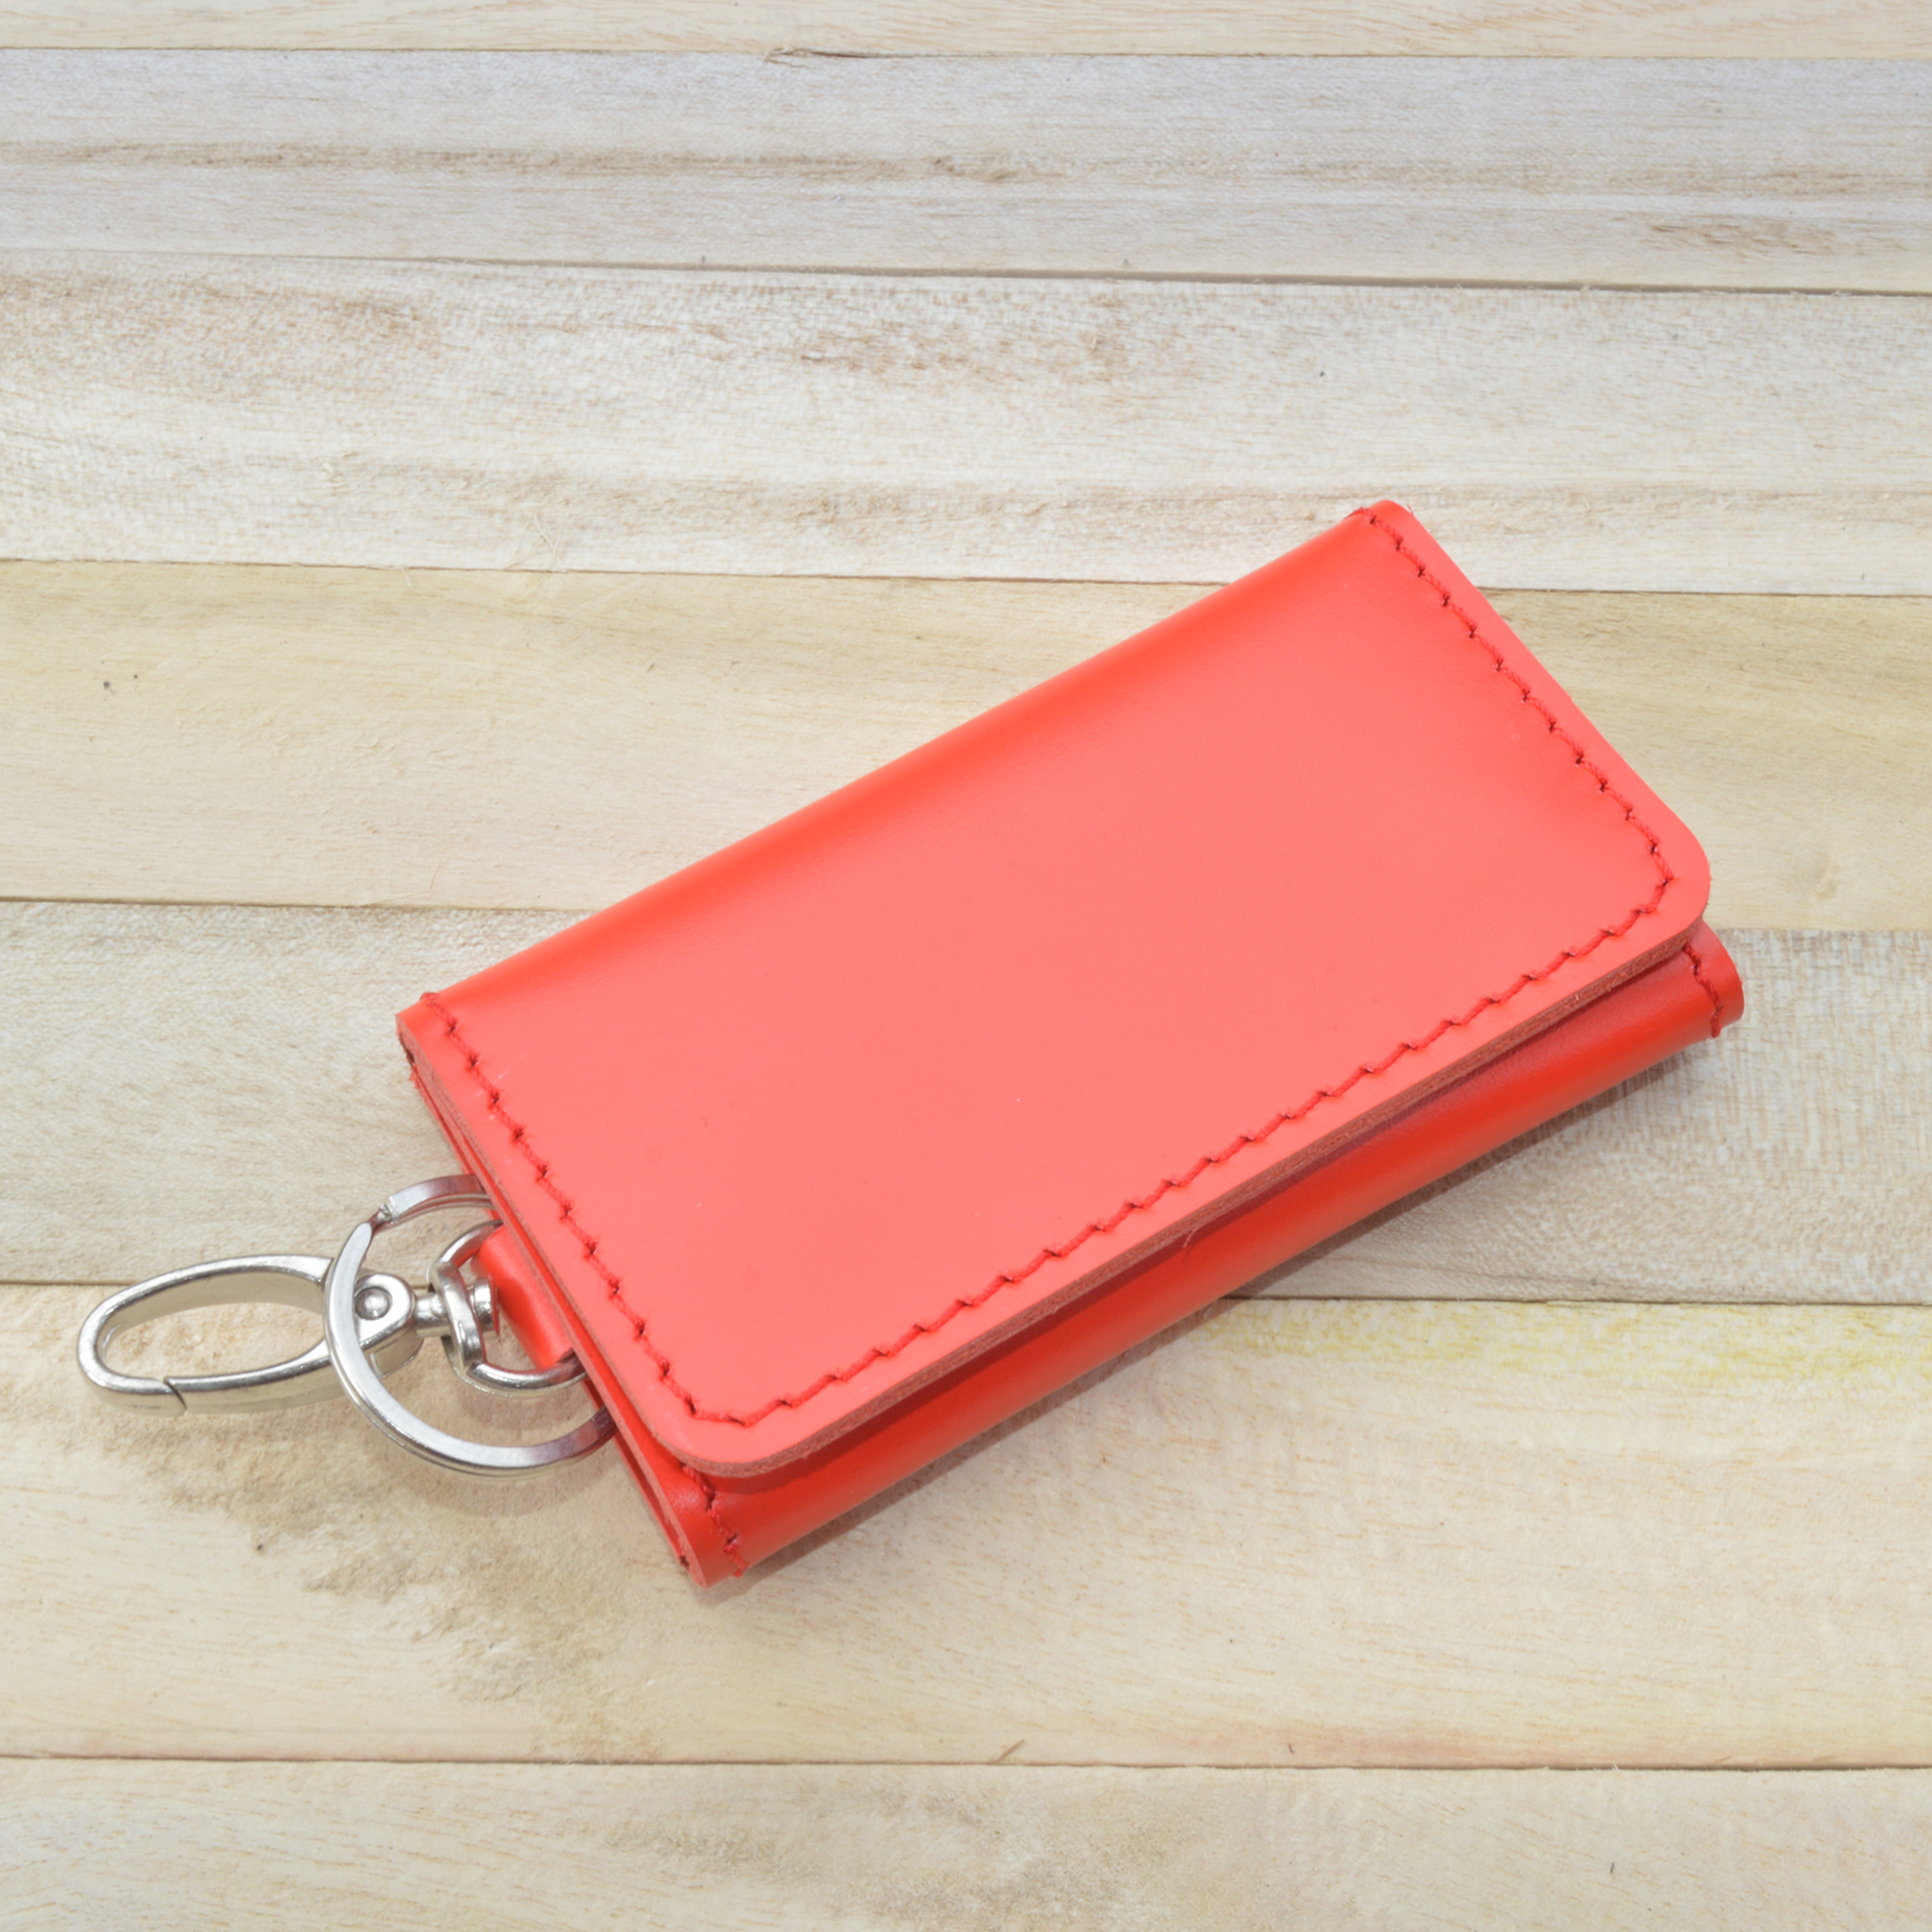 [Produk UKM] - Dompet Stnk Kulit Lipat Tiga Warna Merah | G - Blanja.com